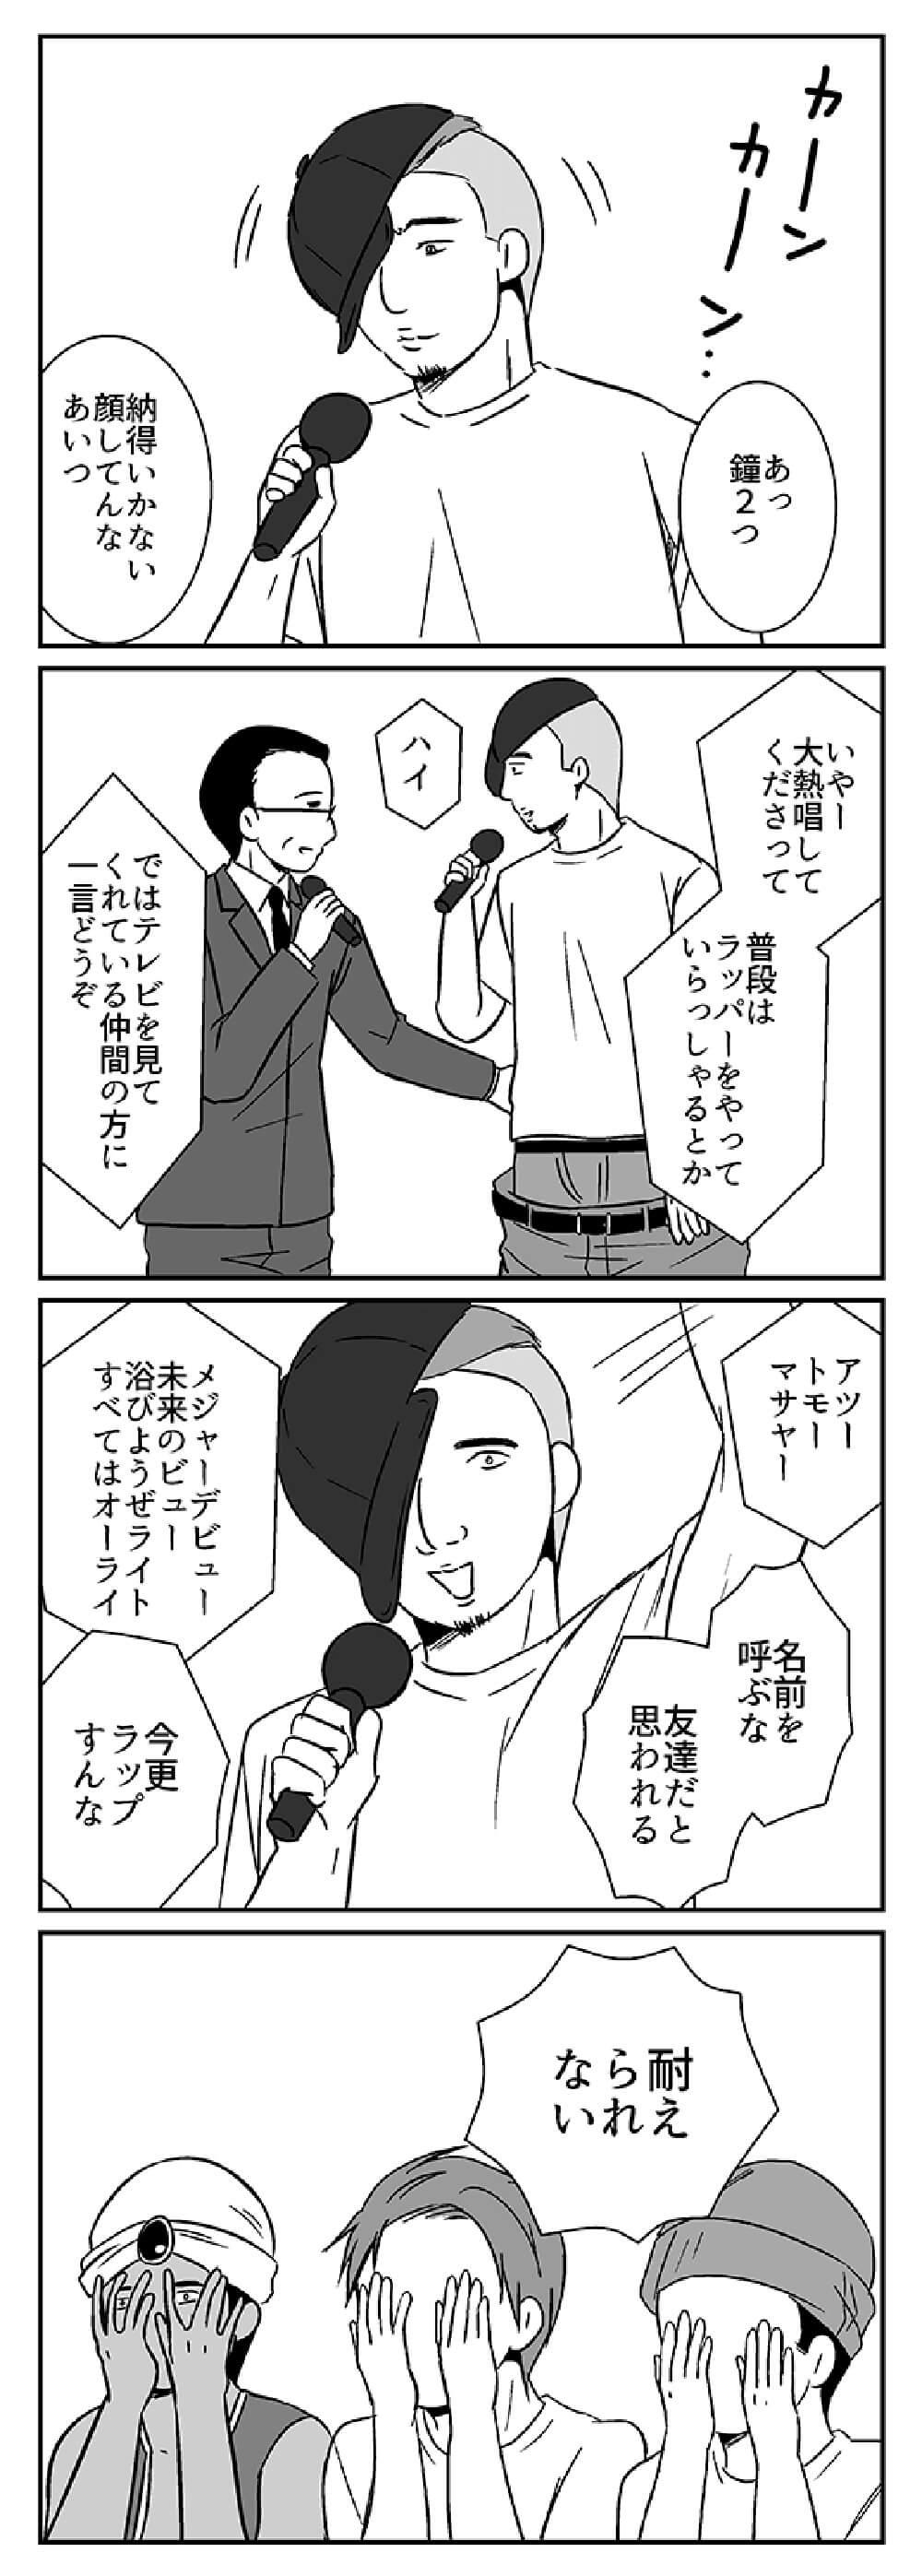 hisashi4_width1000